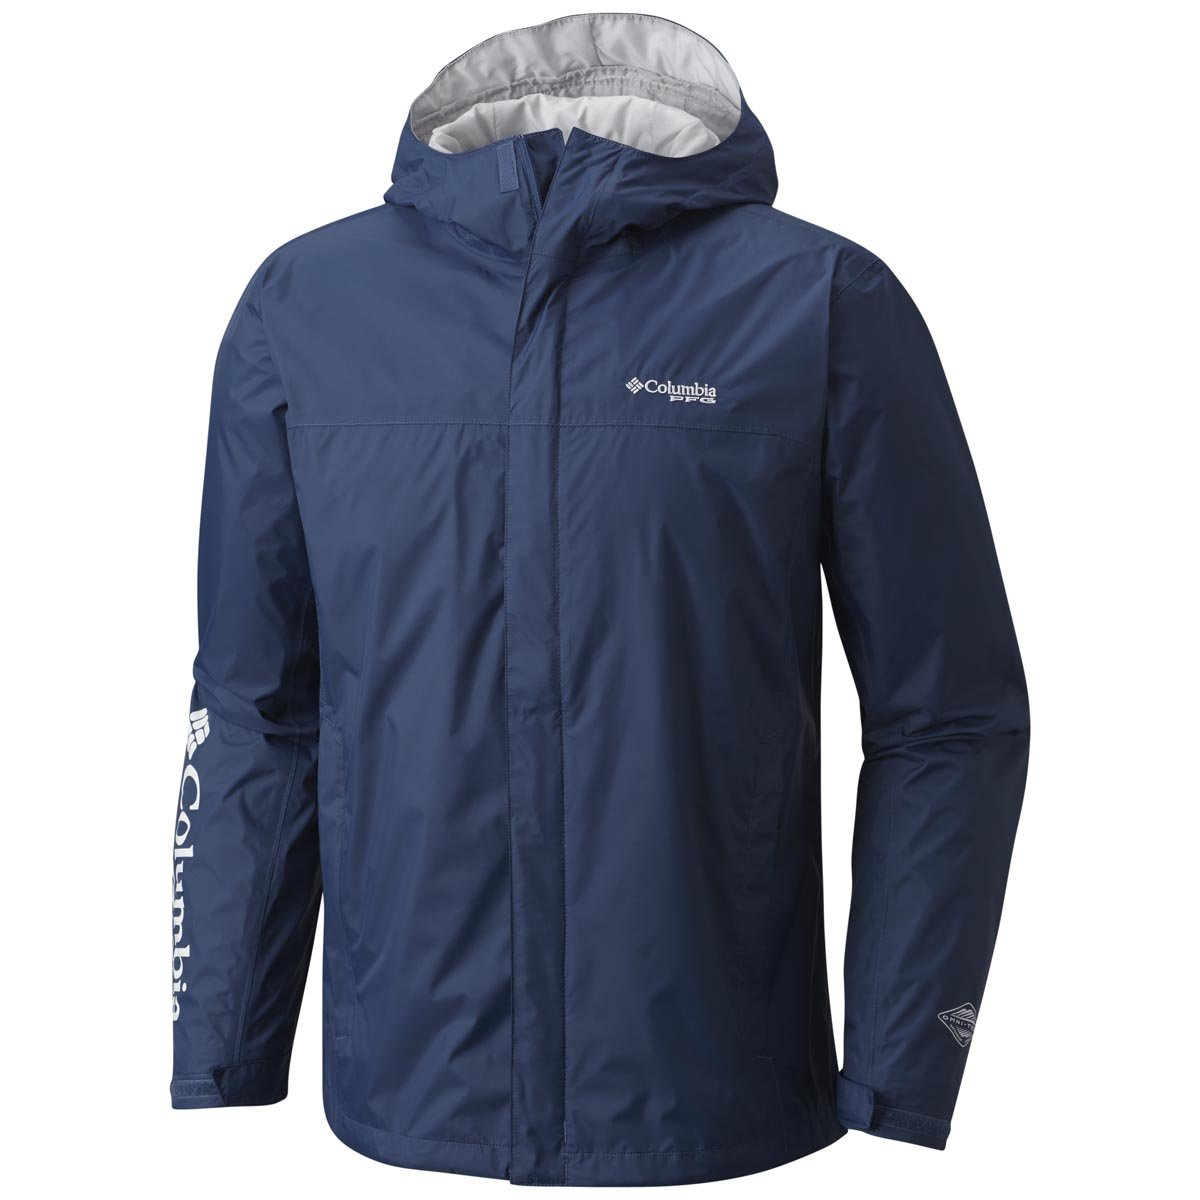 Columbia Men's PFG Storm Jacket Small Night Tide/White